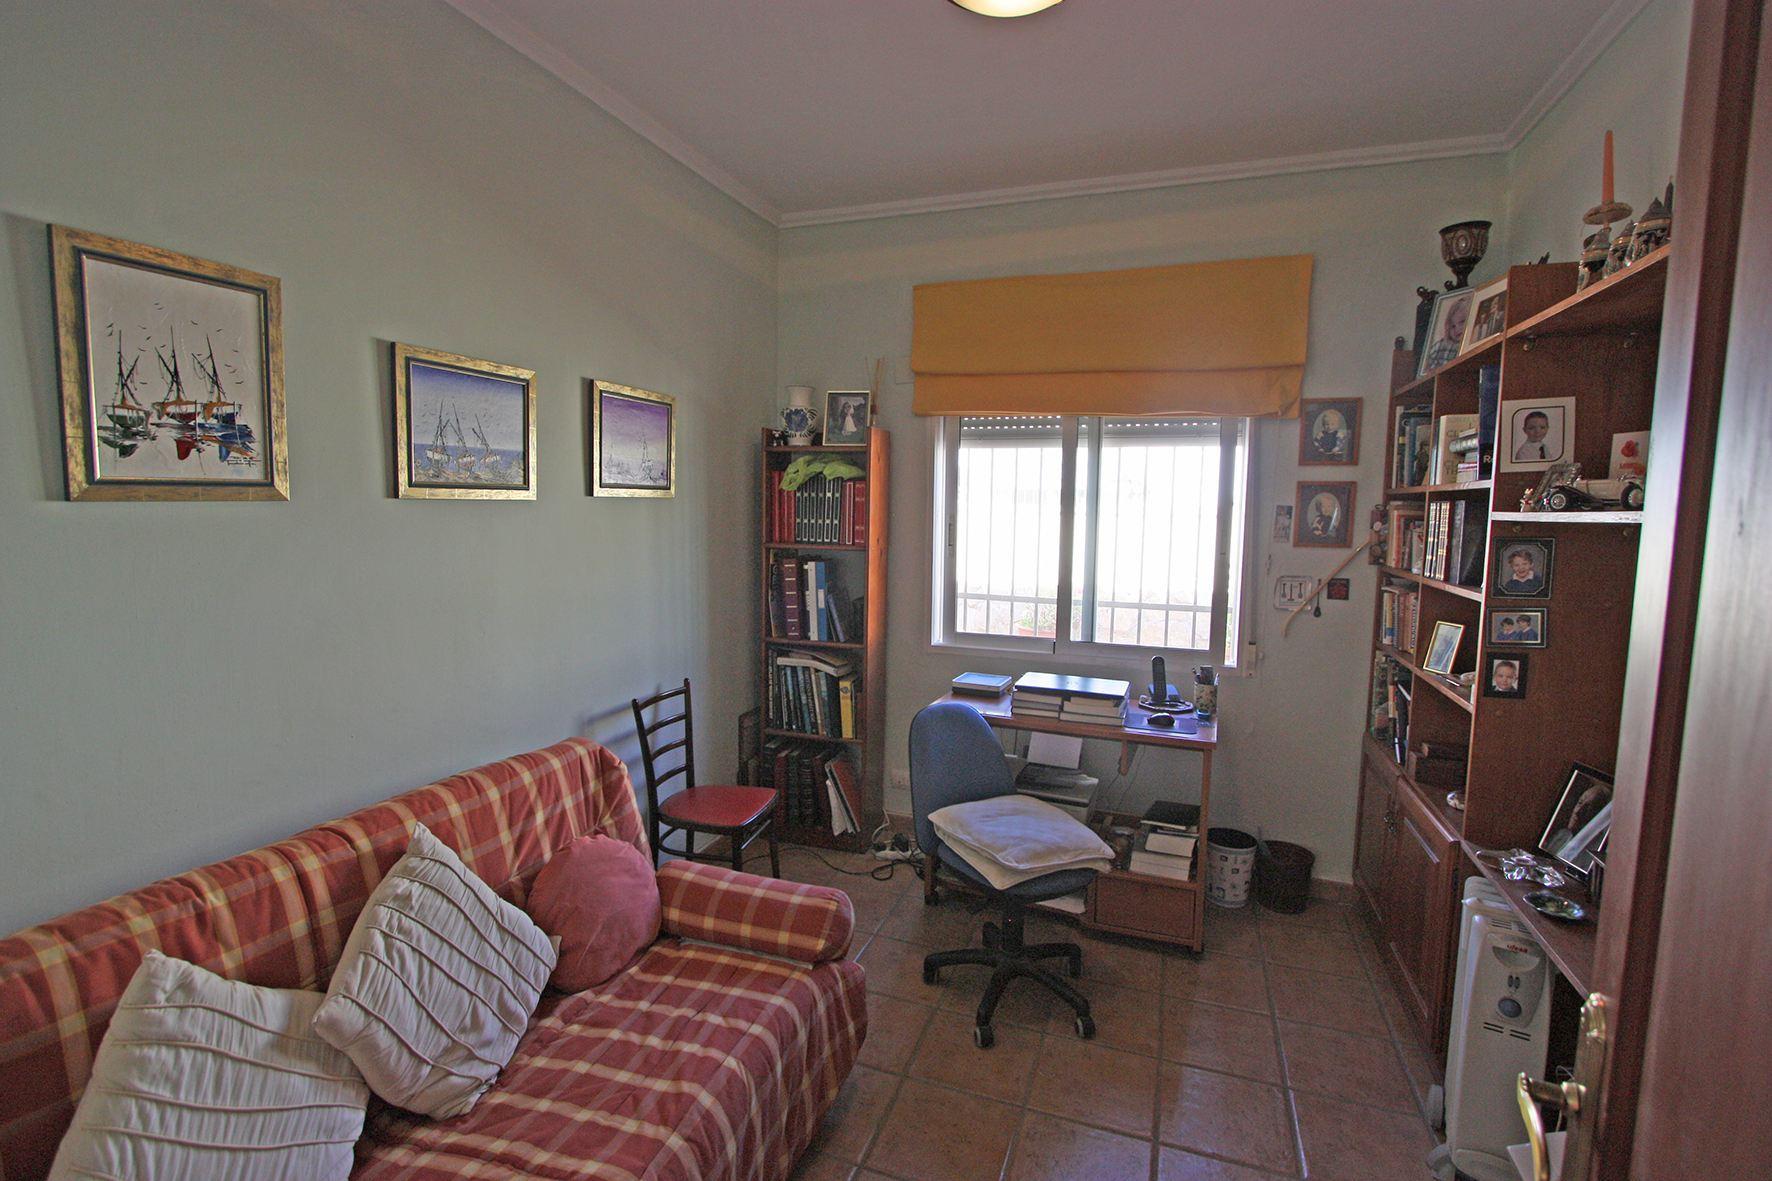 apartamentosdenialowcost-propiedades_60d5bc68591c9-source.jpg